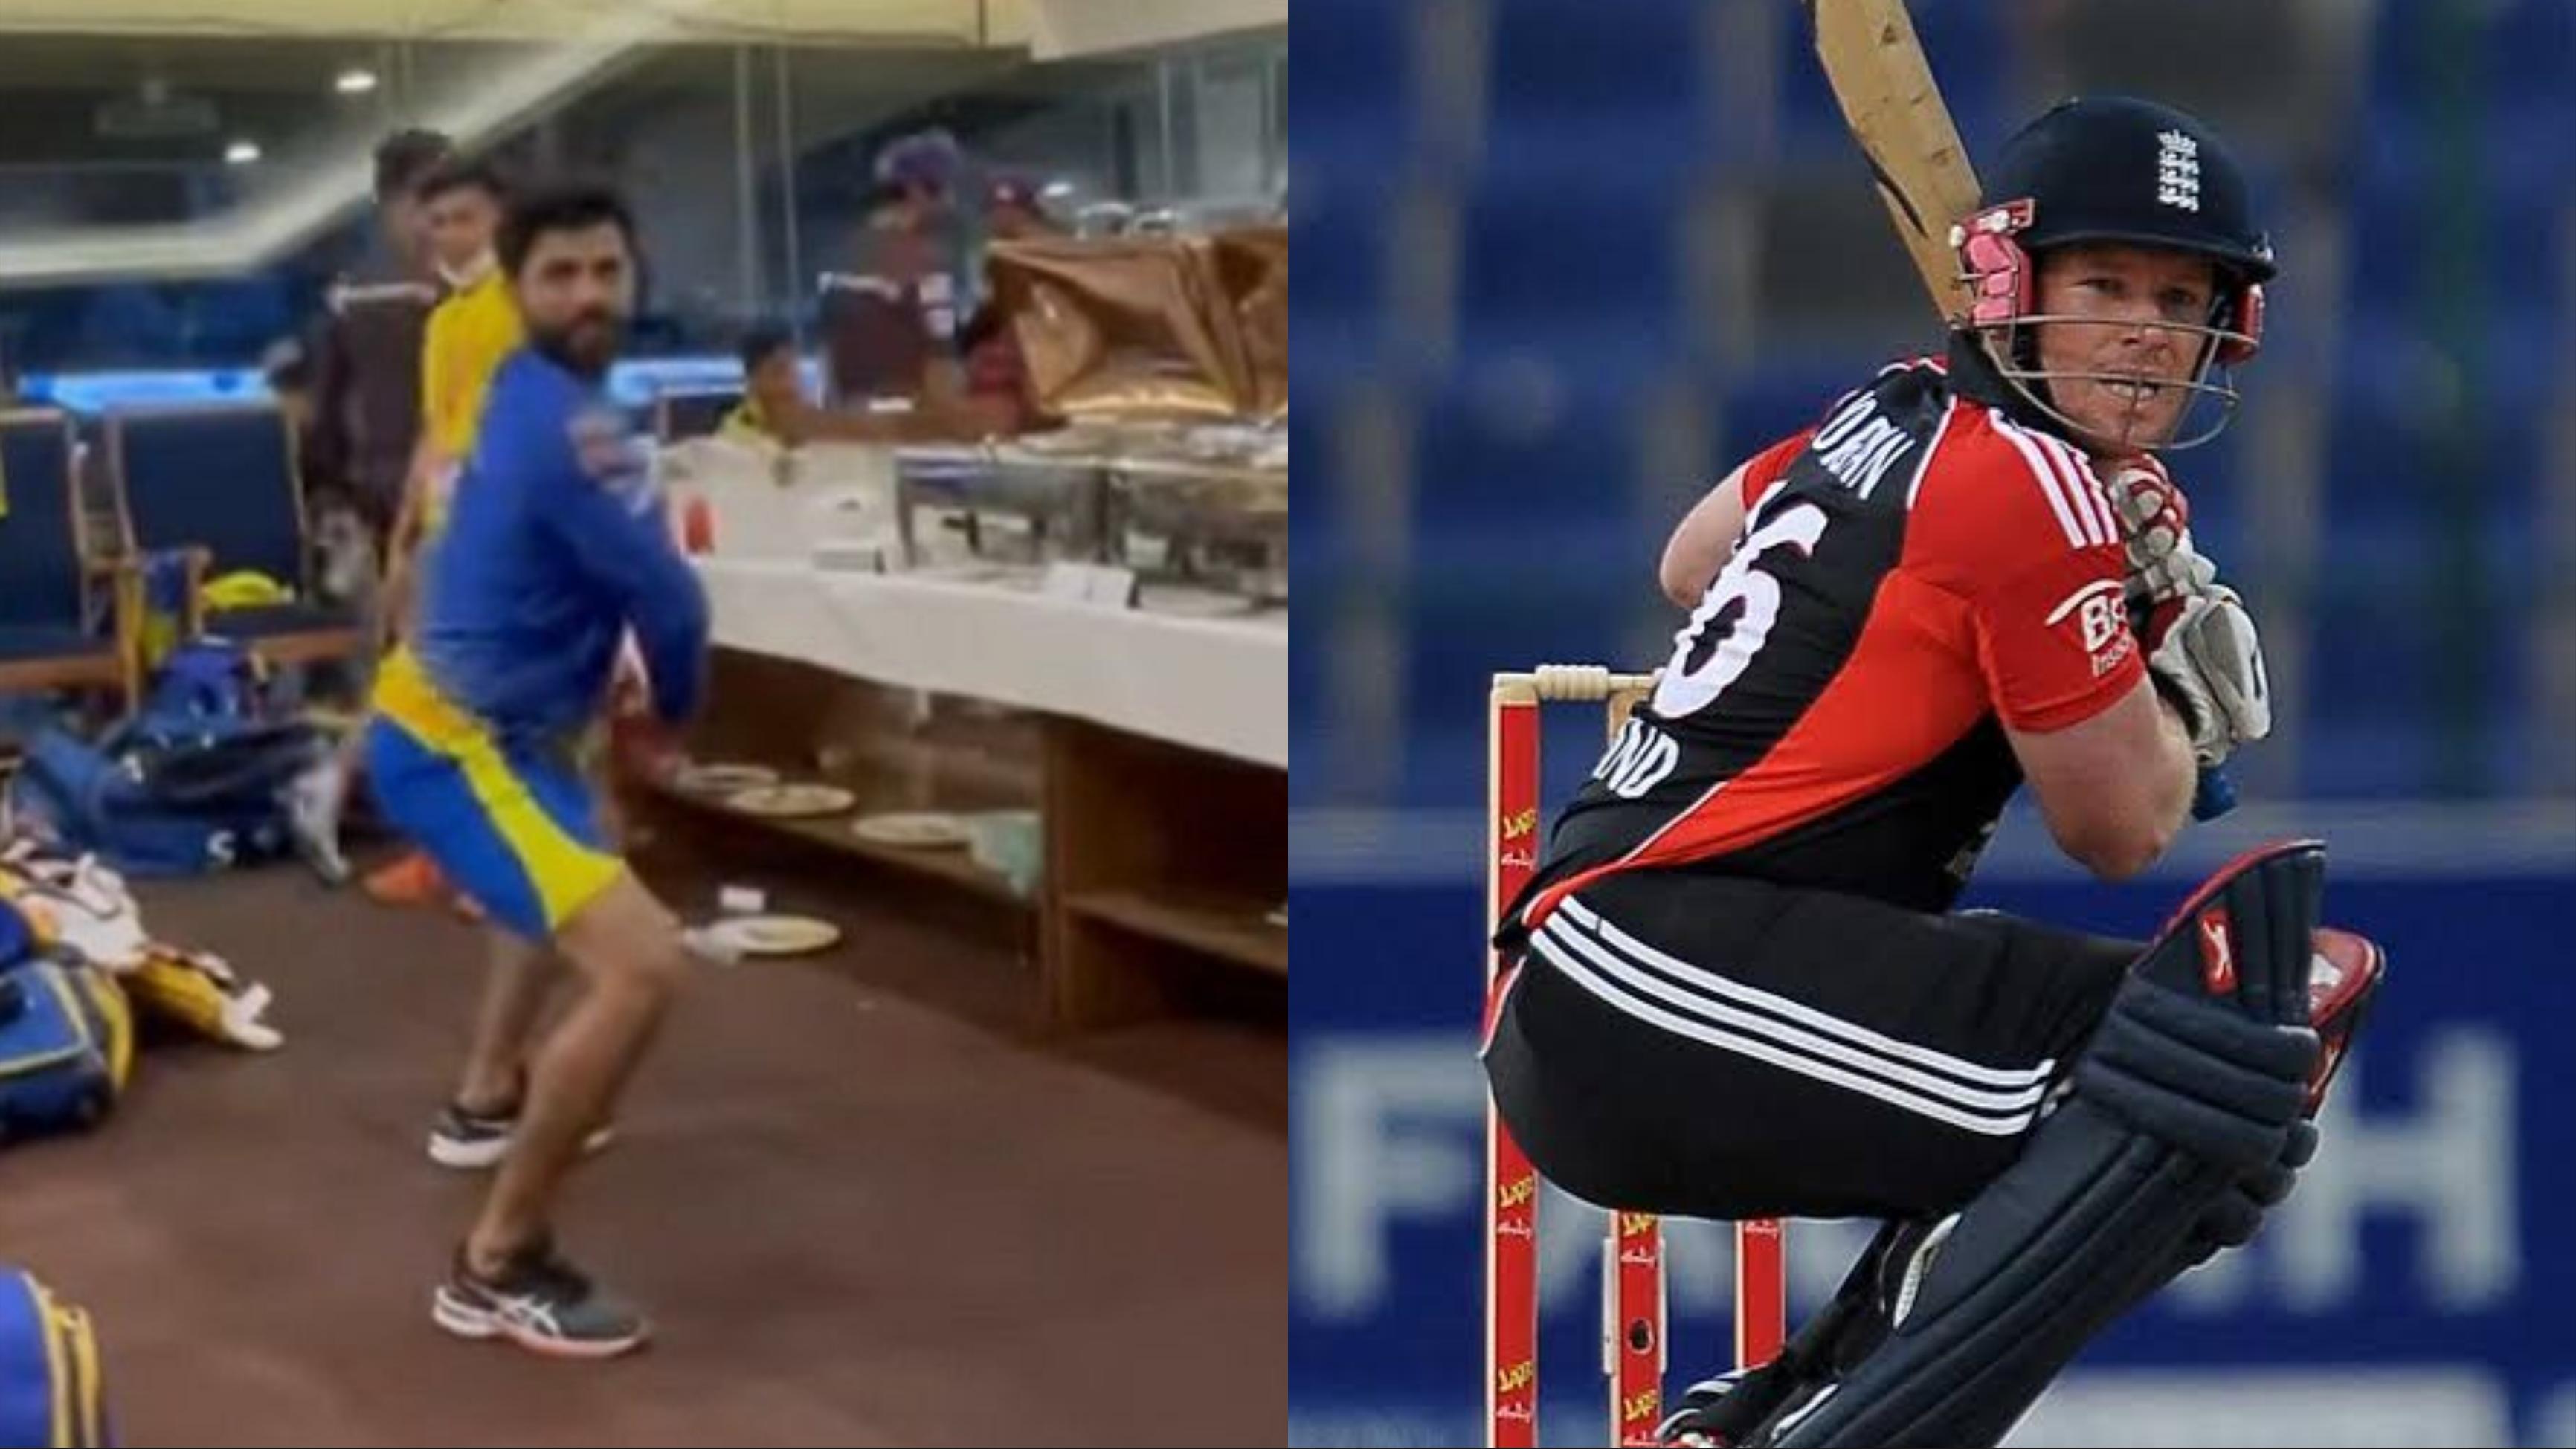 WATCH: Chennai Super Kings' Ravindra Jadeja emulates Eoin Morgan's batting stance